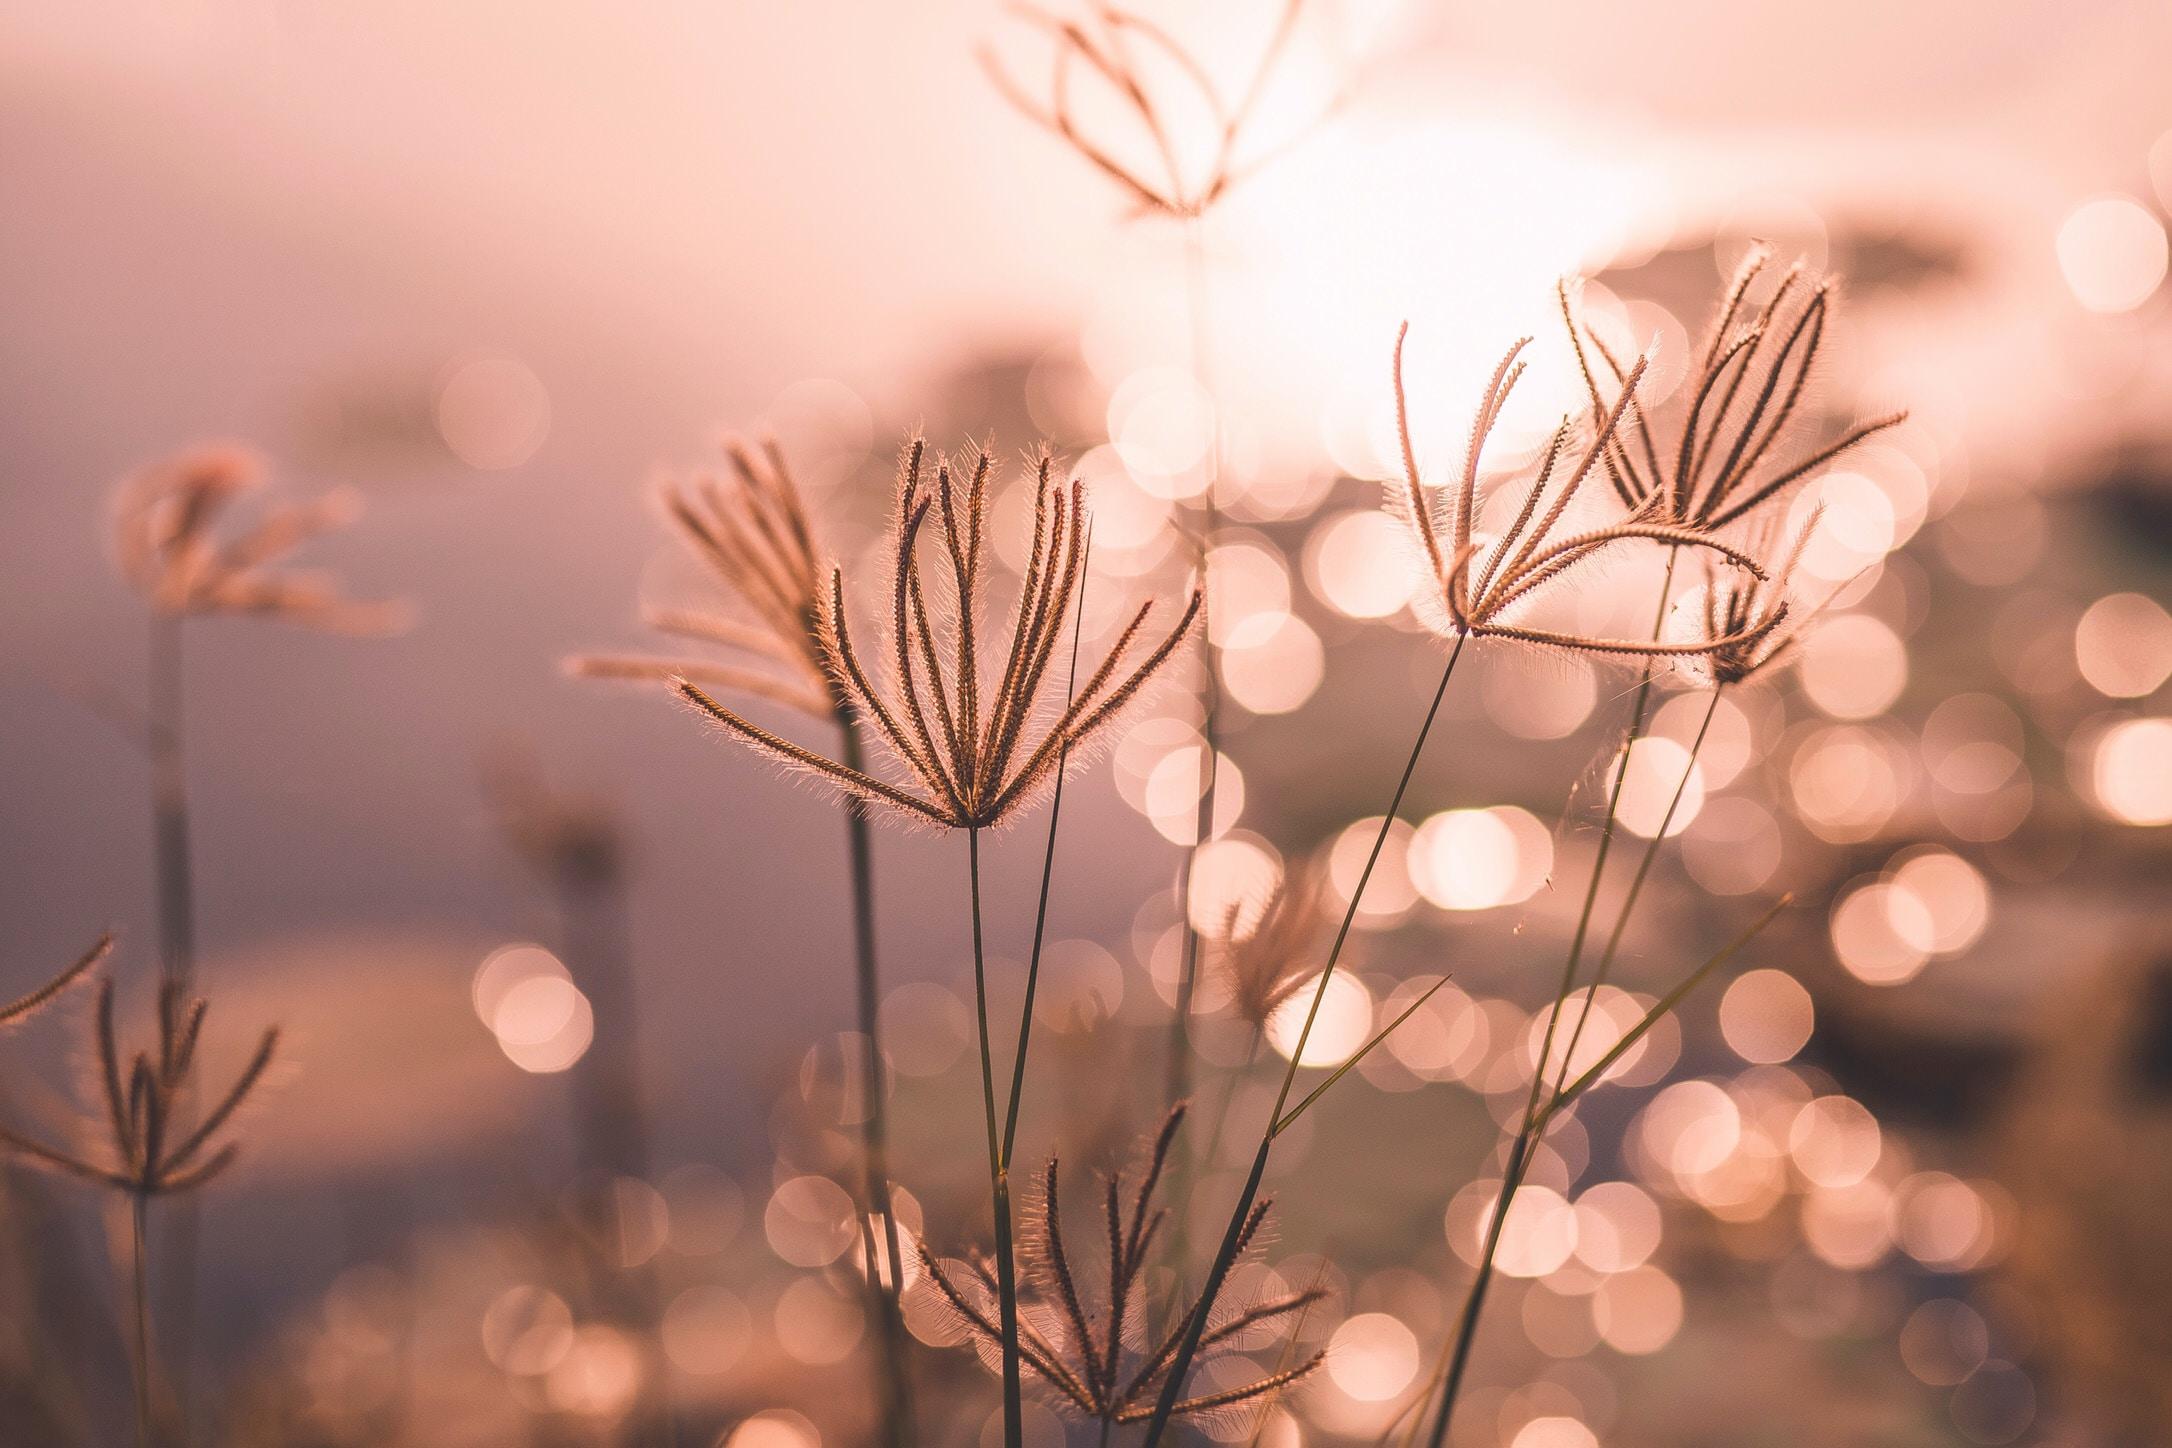 grass in shallow focus lens